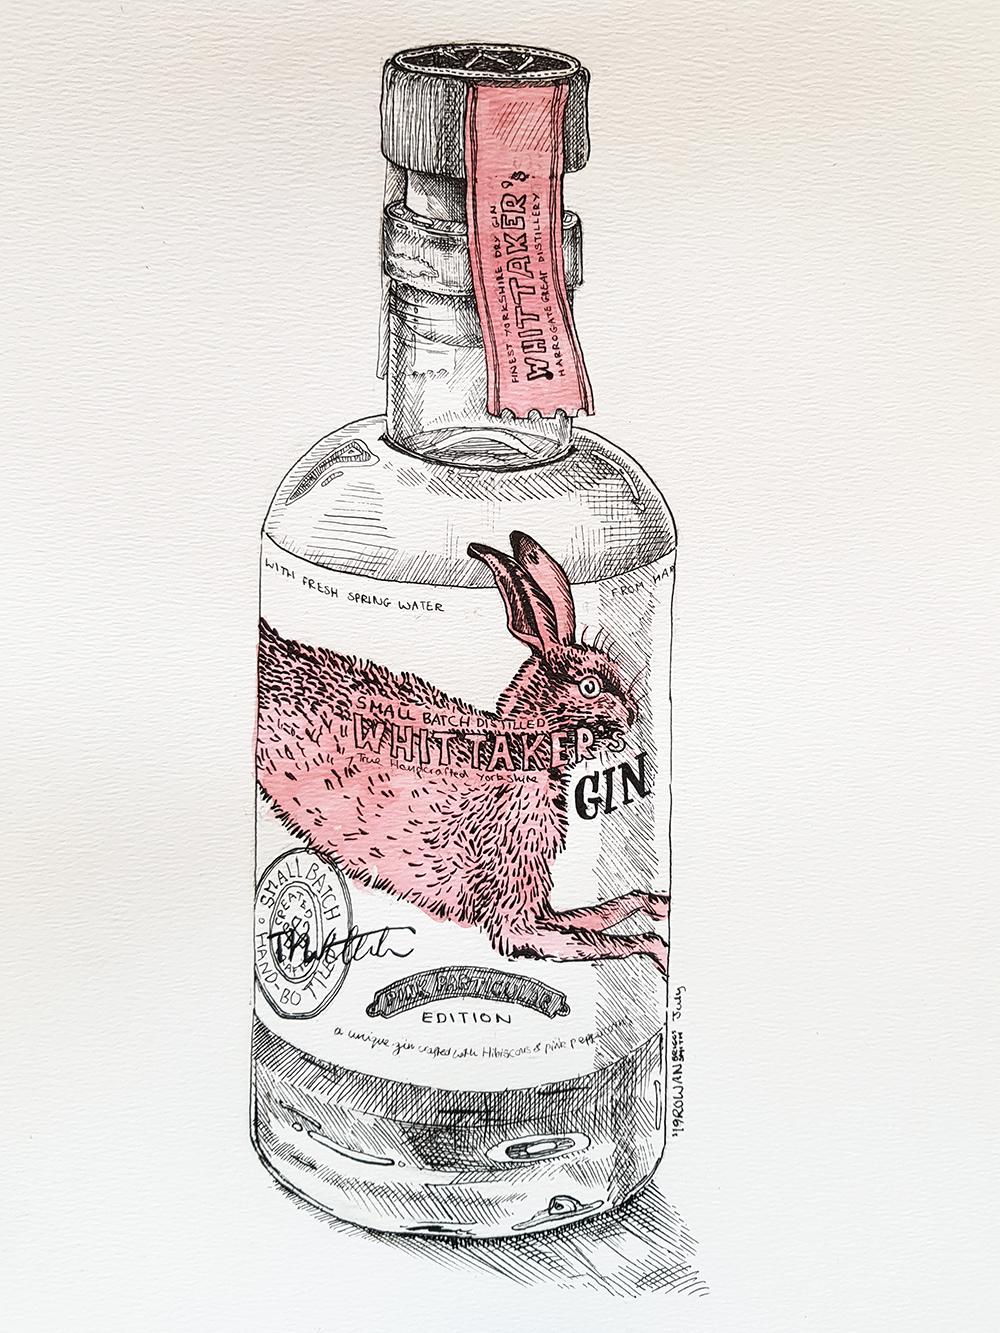 Ink & Nib Rowan Briggs Smith